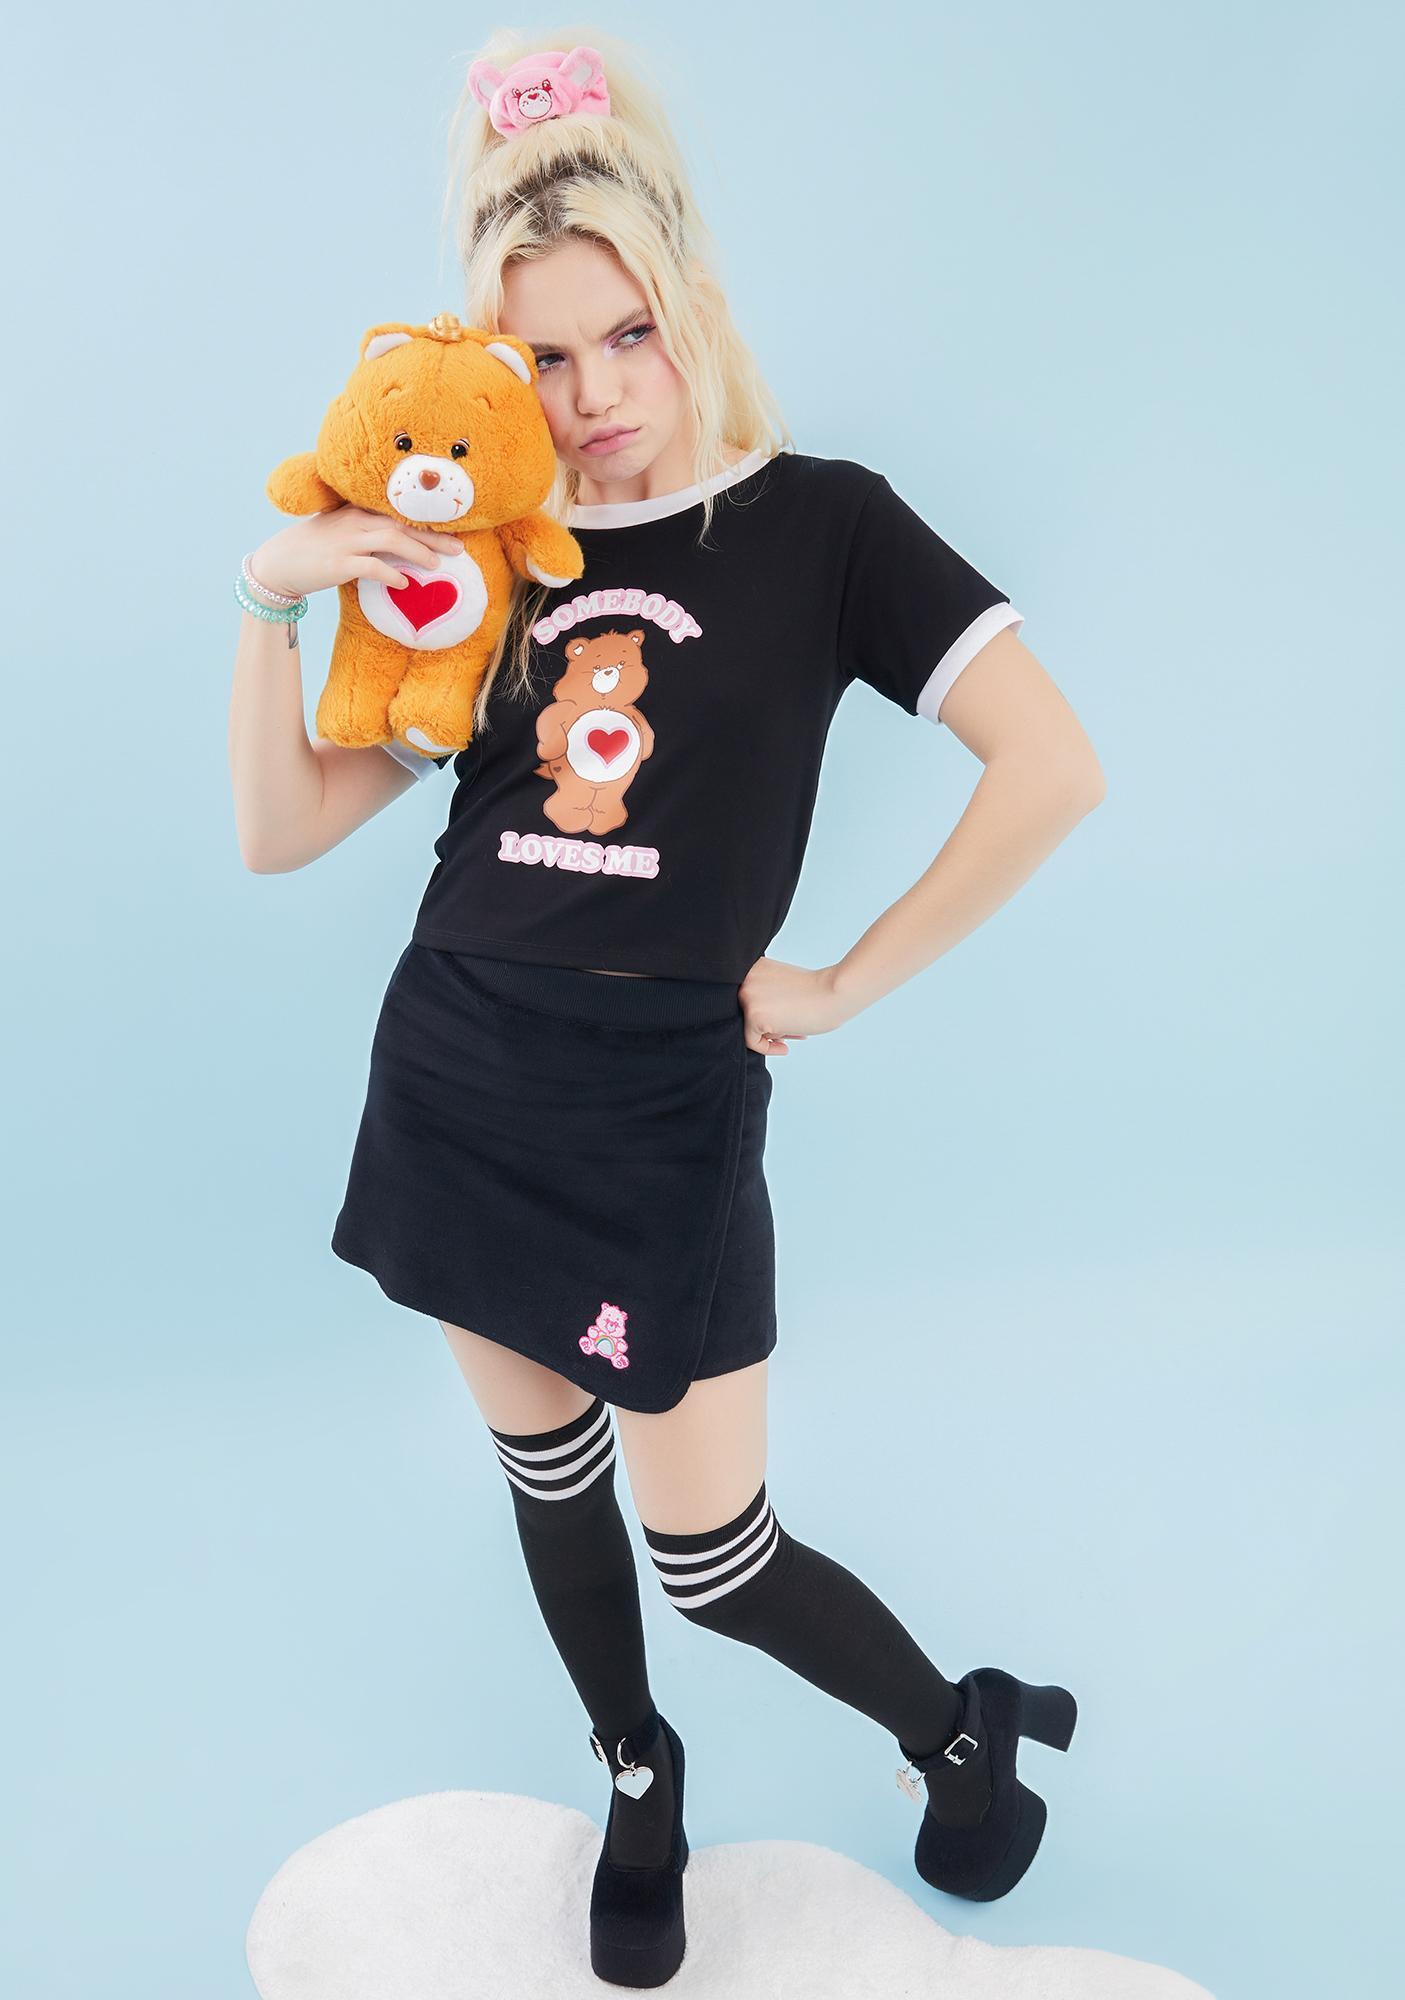 Dolls Kill x Care Bears Dare To Care Wrap Skirt